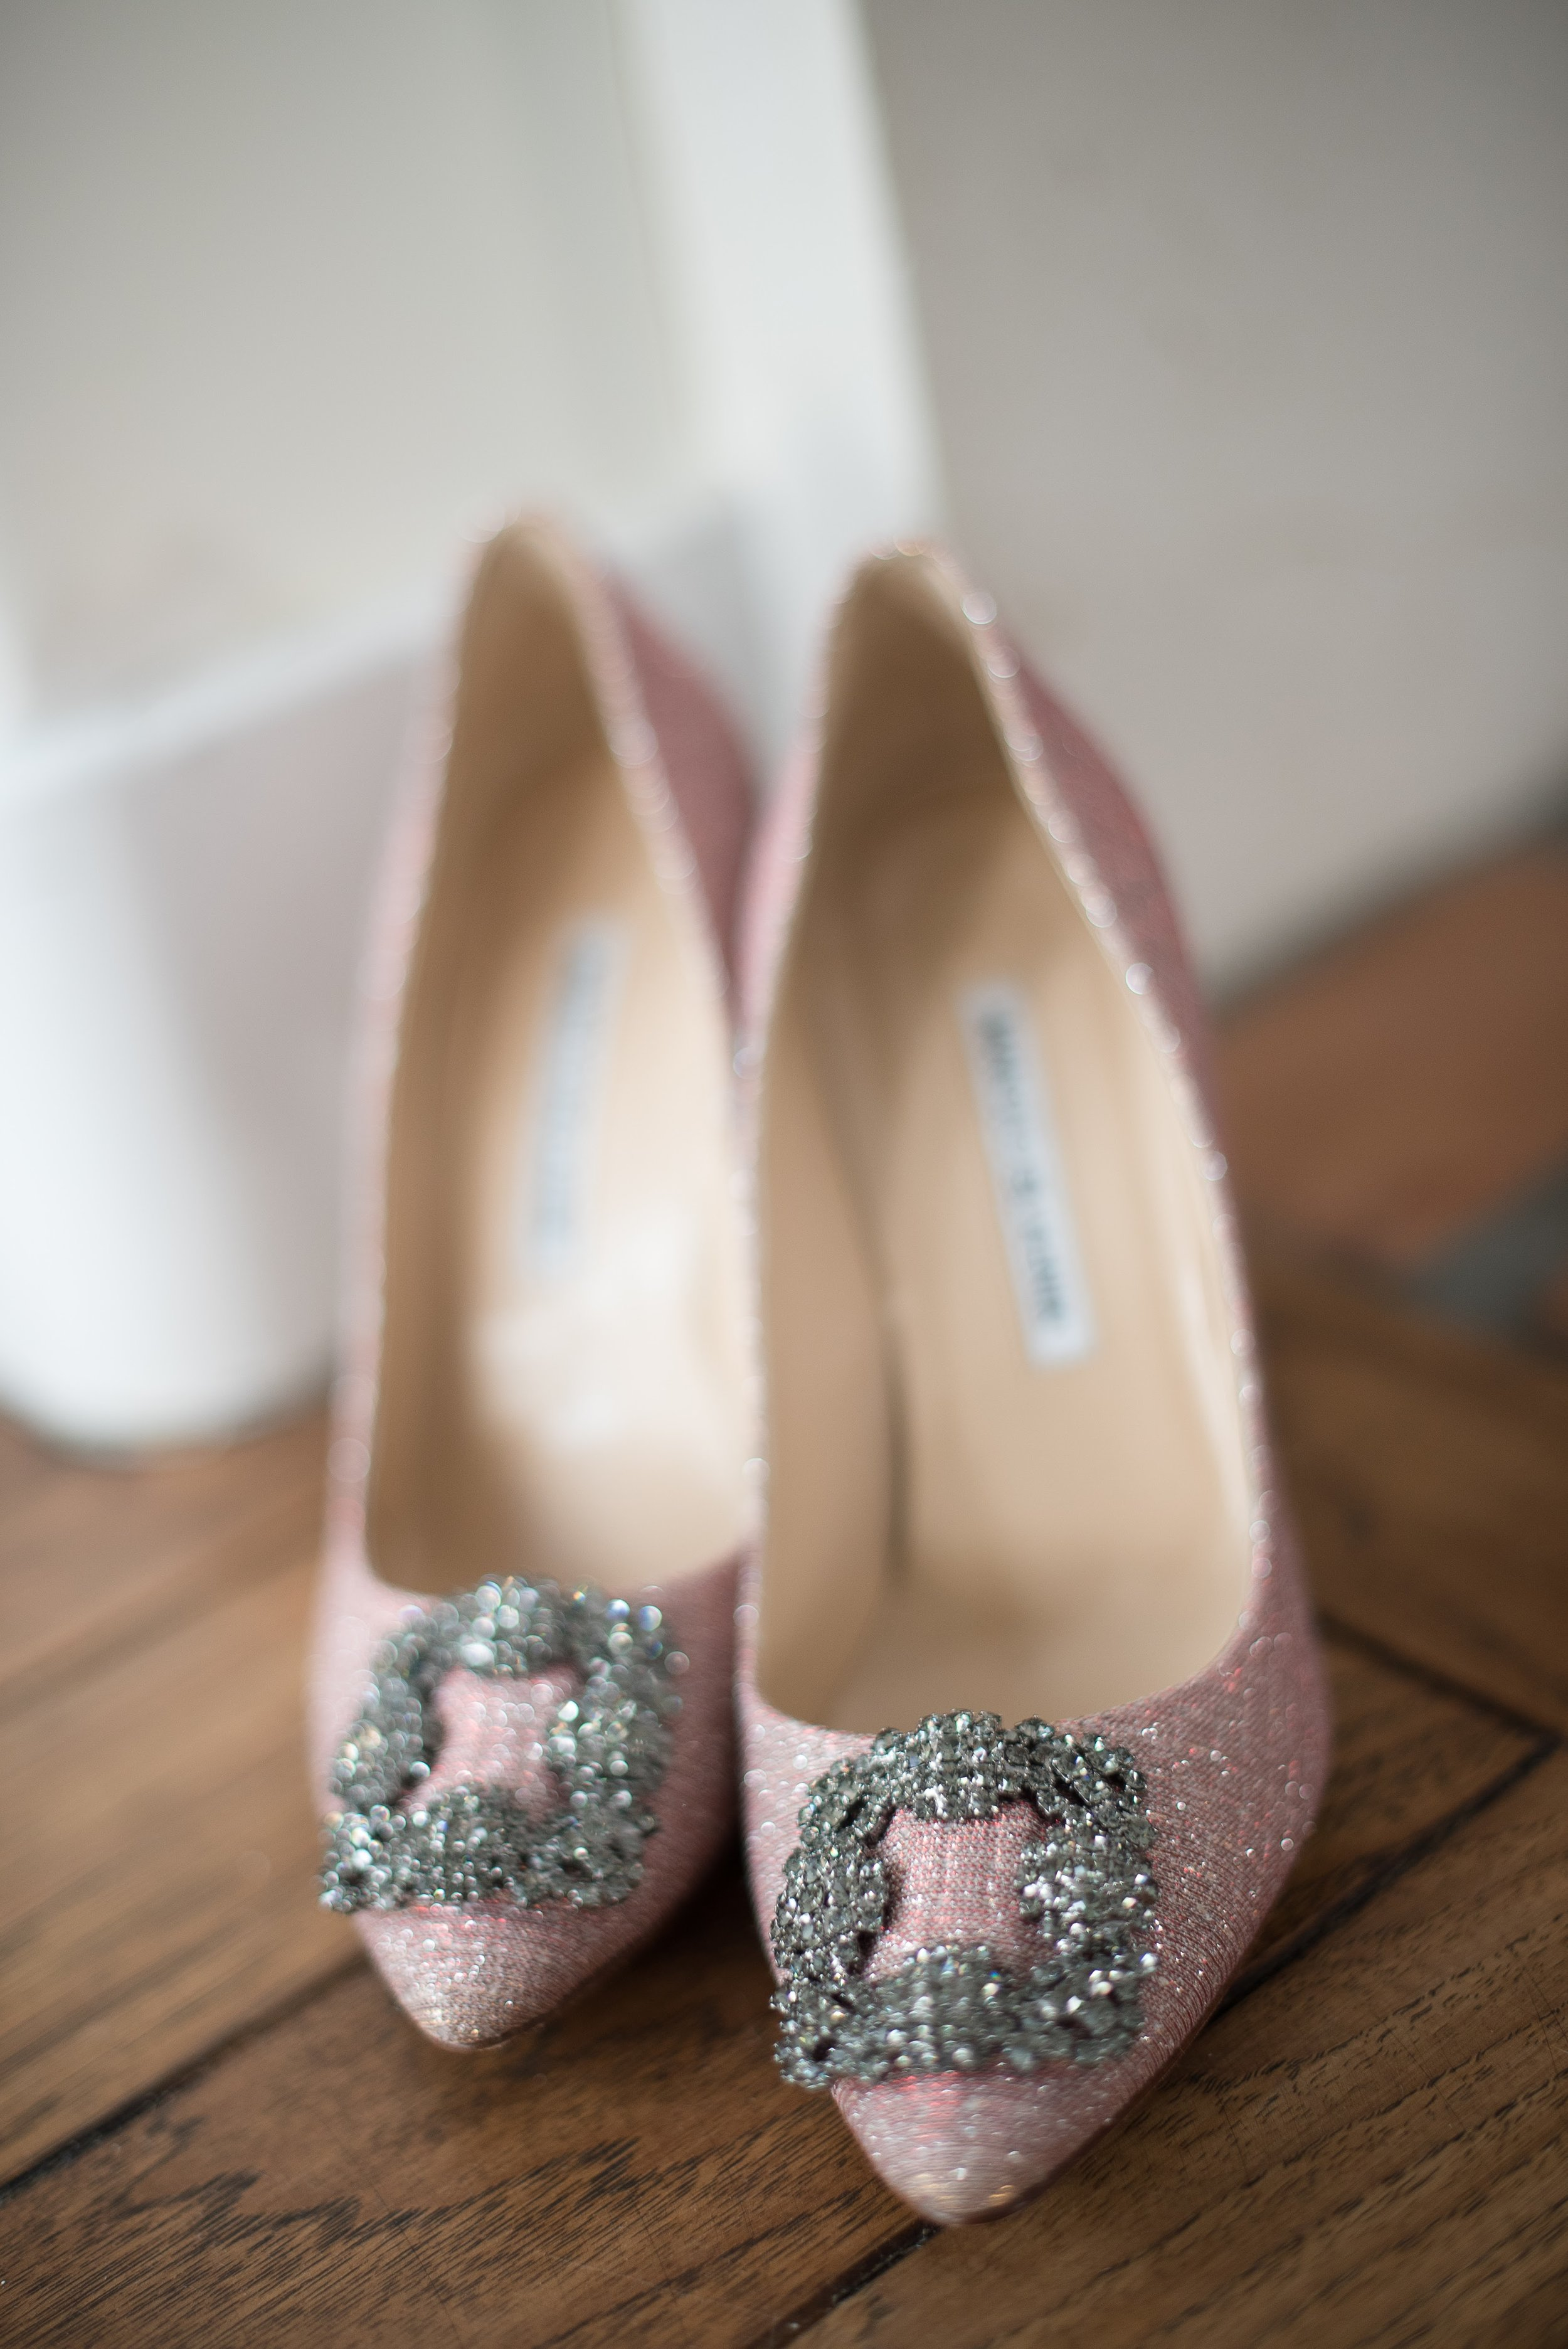 www.santabarbaraweddingstyle.com | Santa Barbara Wedding Style | Wedding Shoes | Pink Manolo Blahnik | El Encanto Wedding | Nate and Jenny Weddings